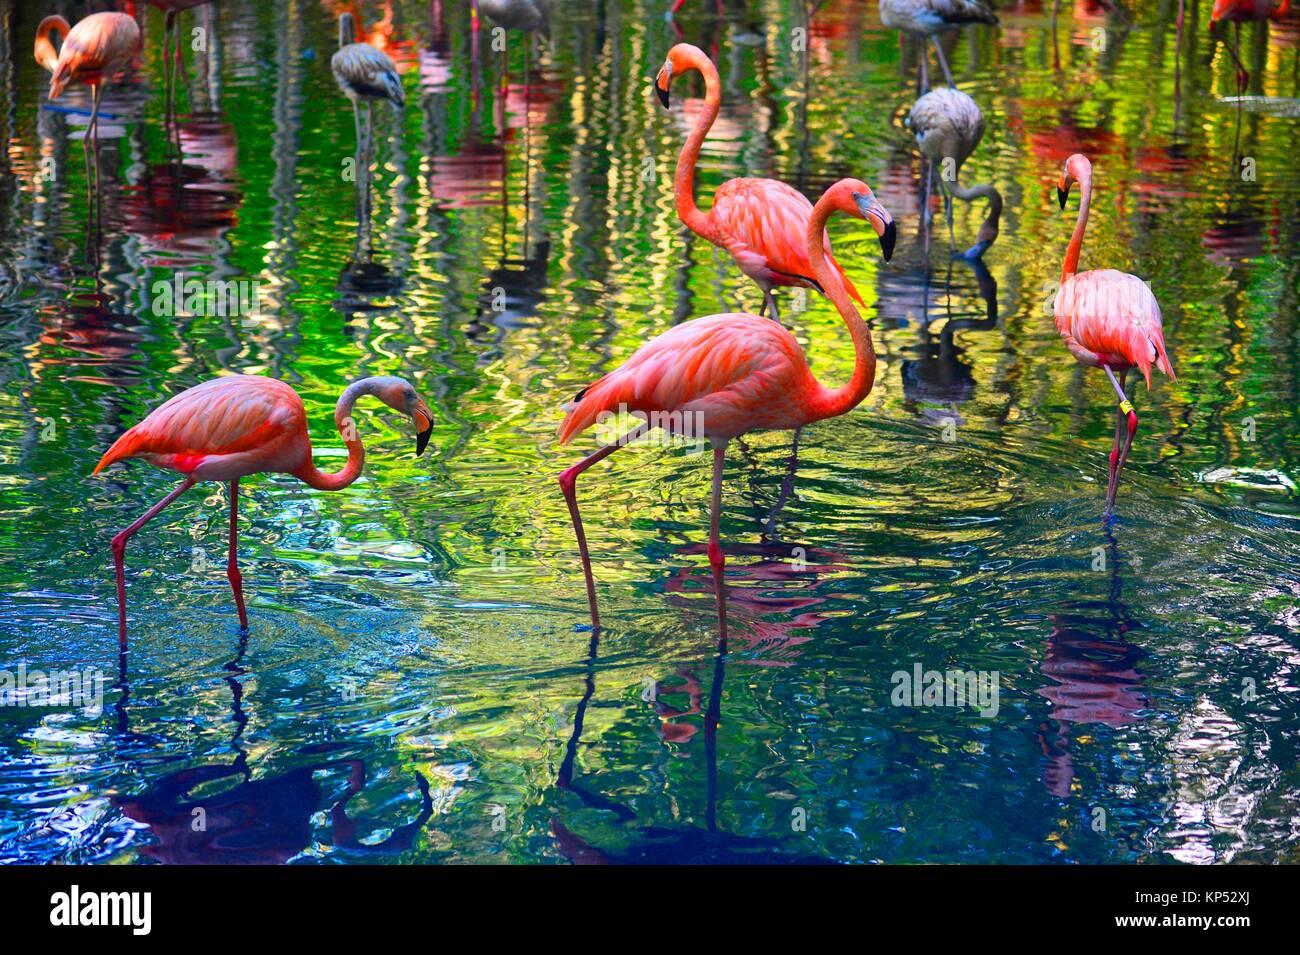 American flamingo,Aviario National de Colombia,Isla Baru, Colombia, South America. - Stock Image